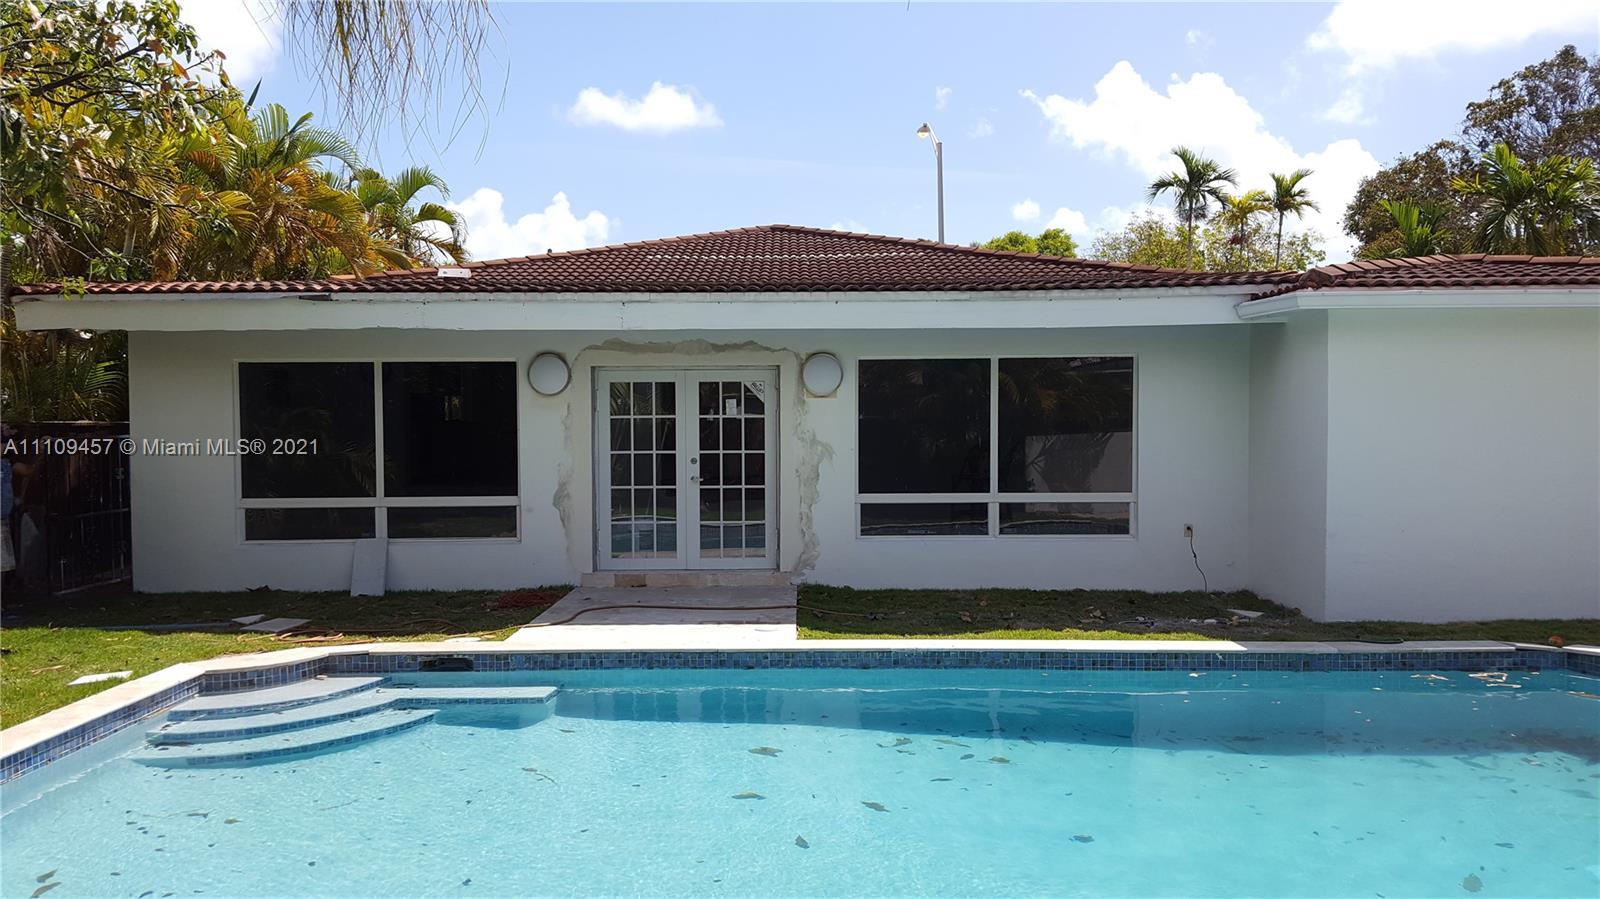 La Gorce Golf - 5350 Alton Rd, Miami Beach, FL 33140